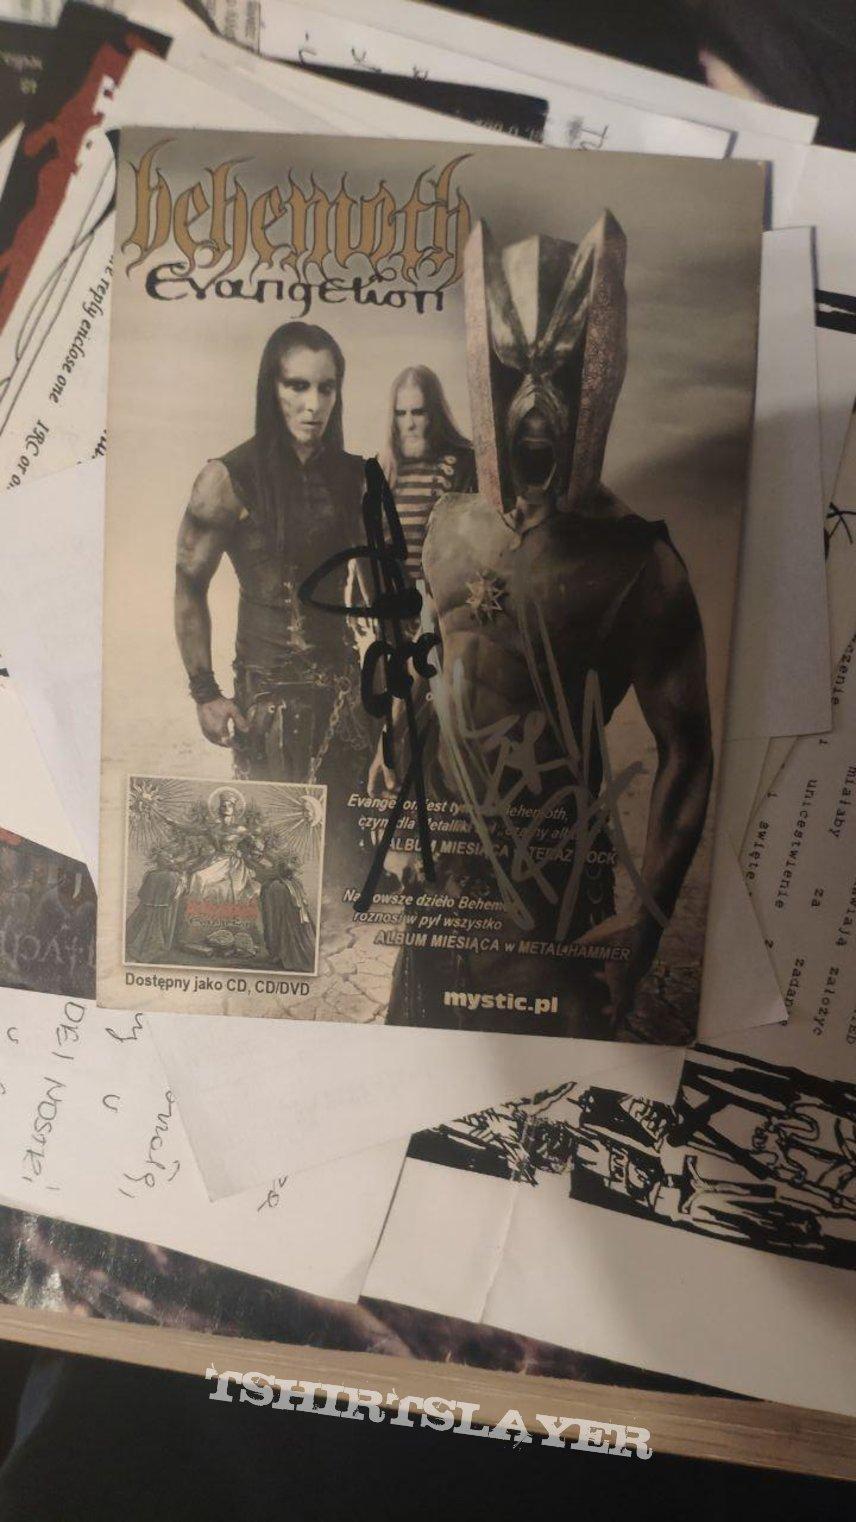 Behemoth - Evangelion flyer Mystic